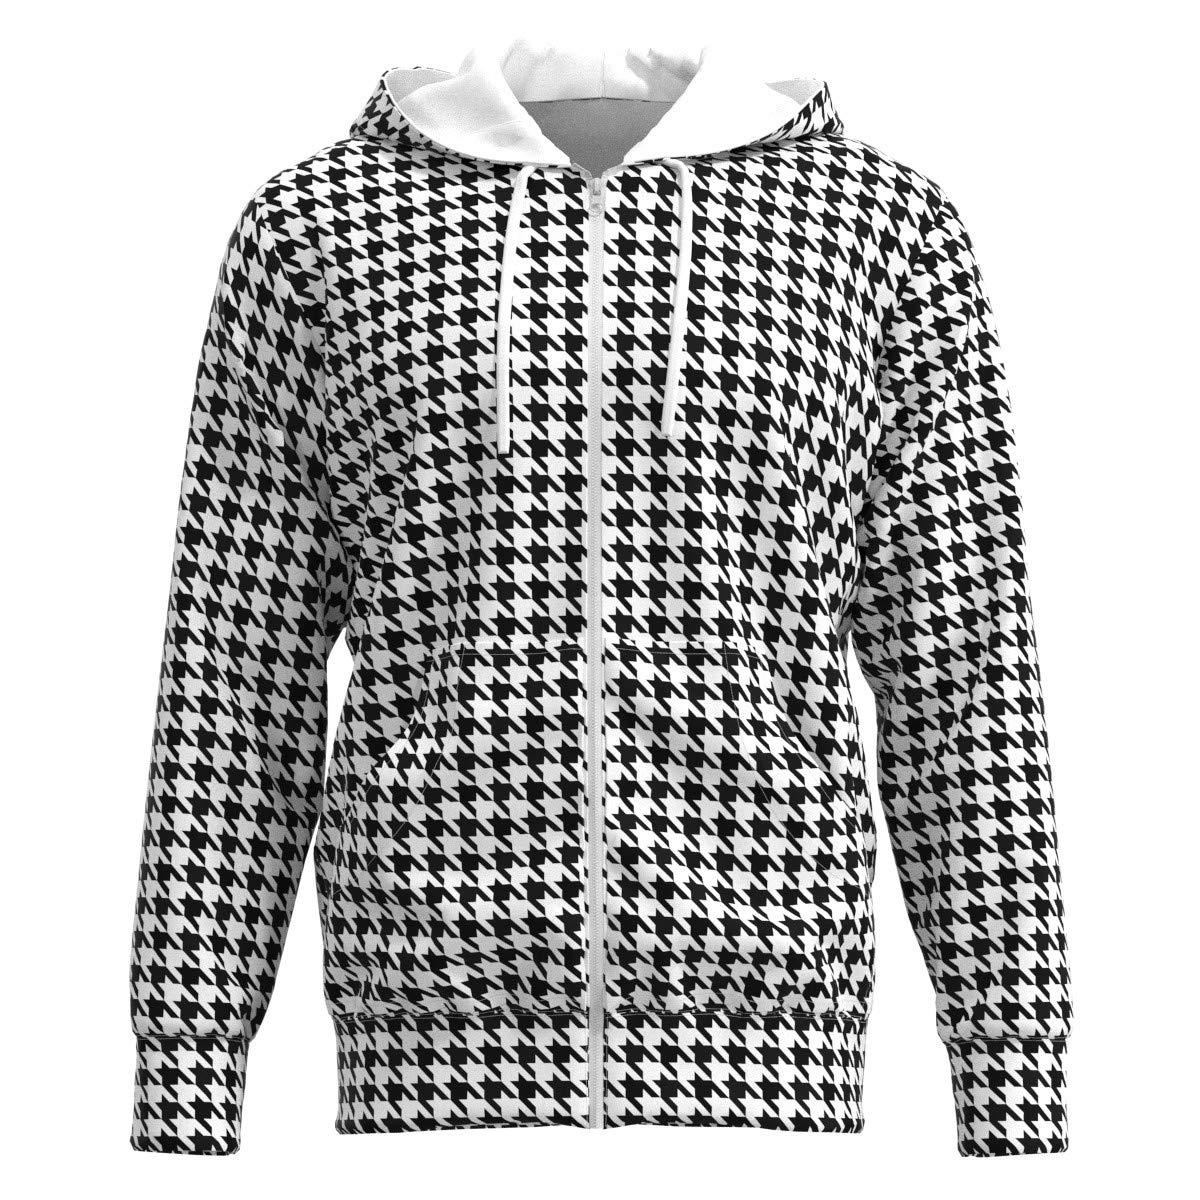 EightyThree XYZ Black White Houndstooth Women Zipper Hoodie Sweatshirt XS-3XL